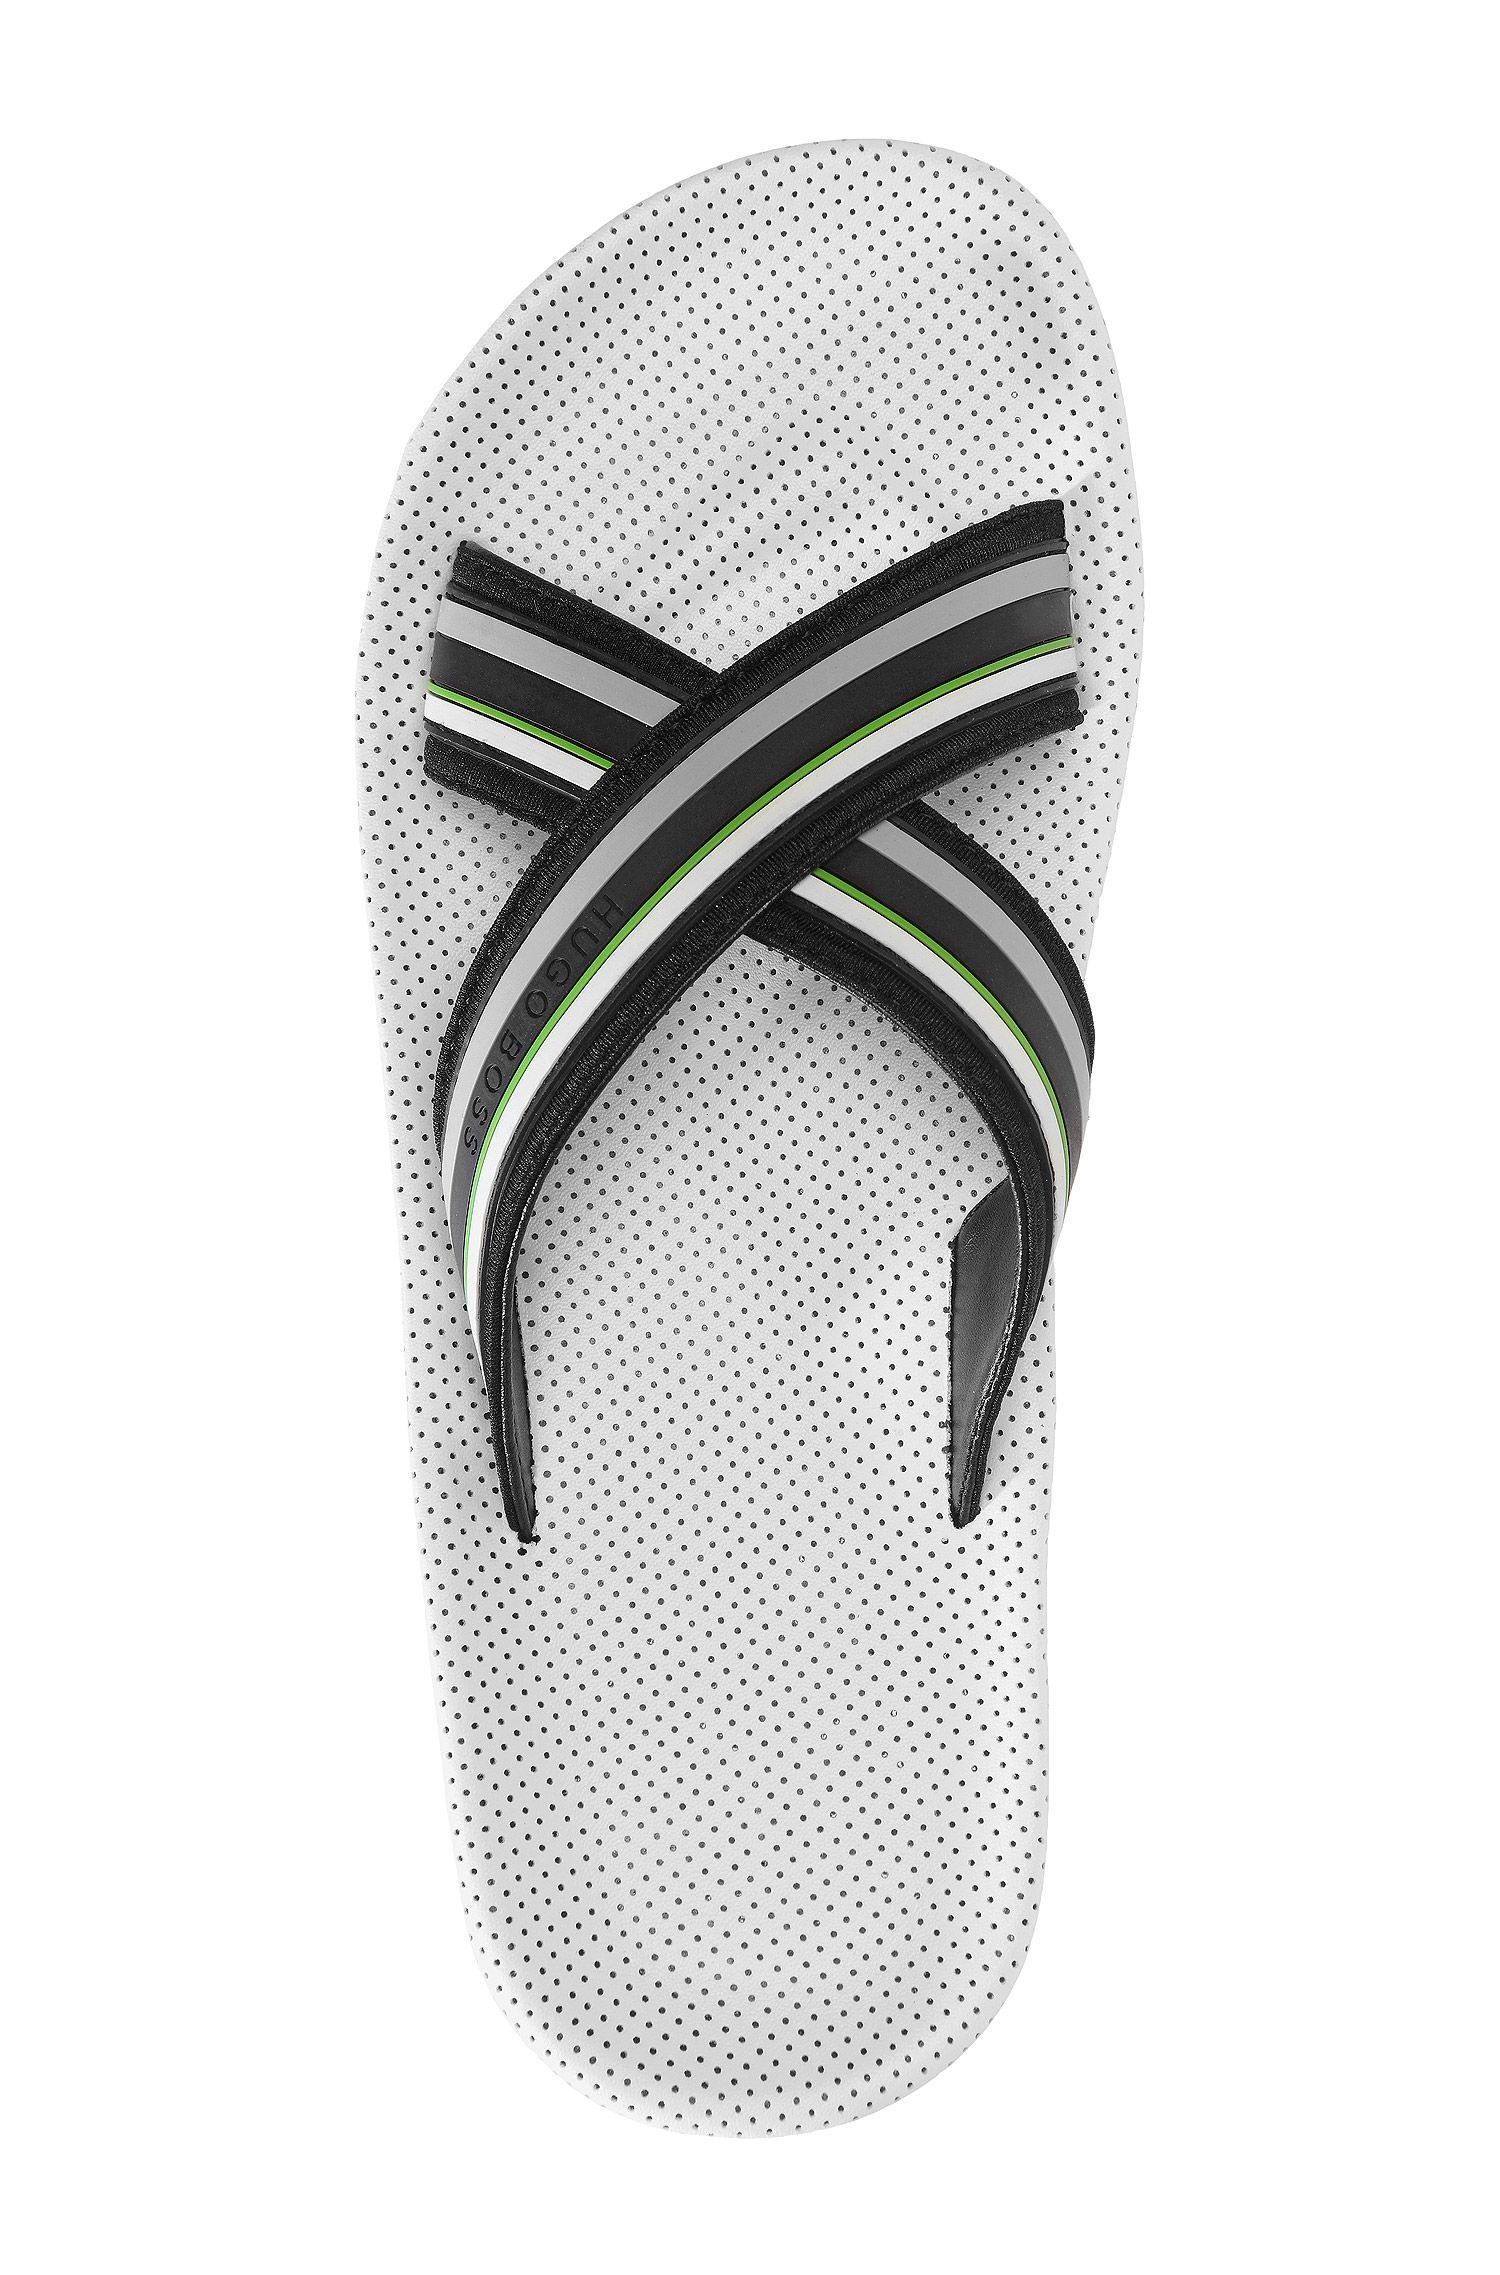 Sandale ´Shoreline I Web` ohne Verschluss